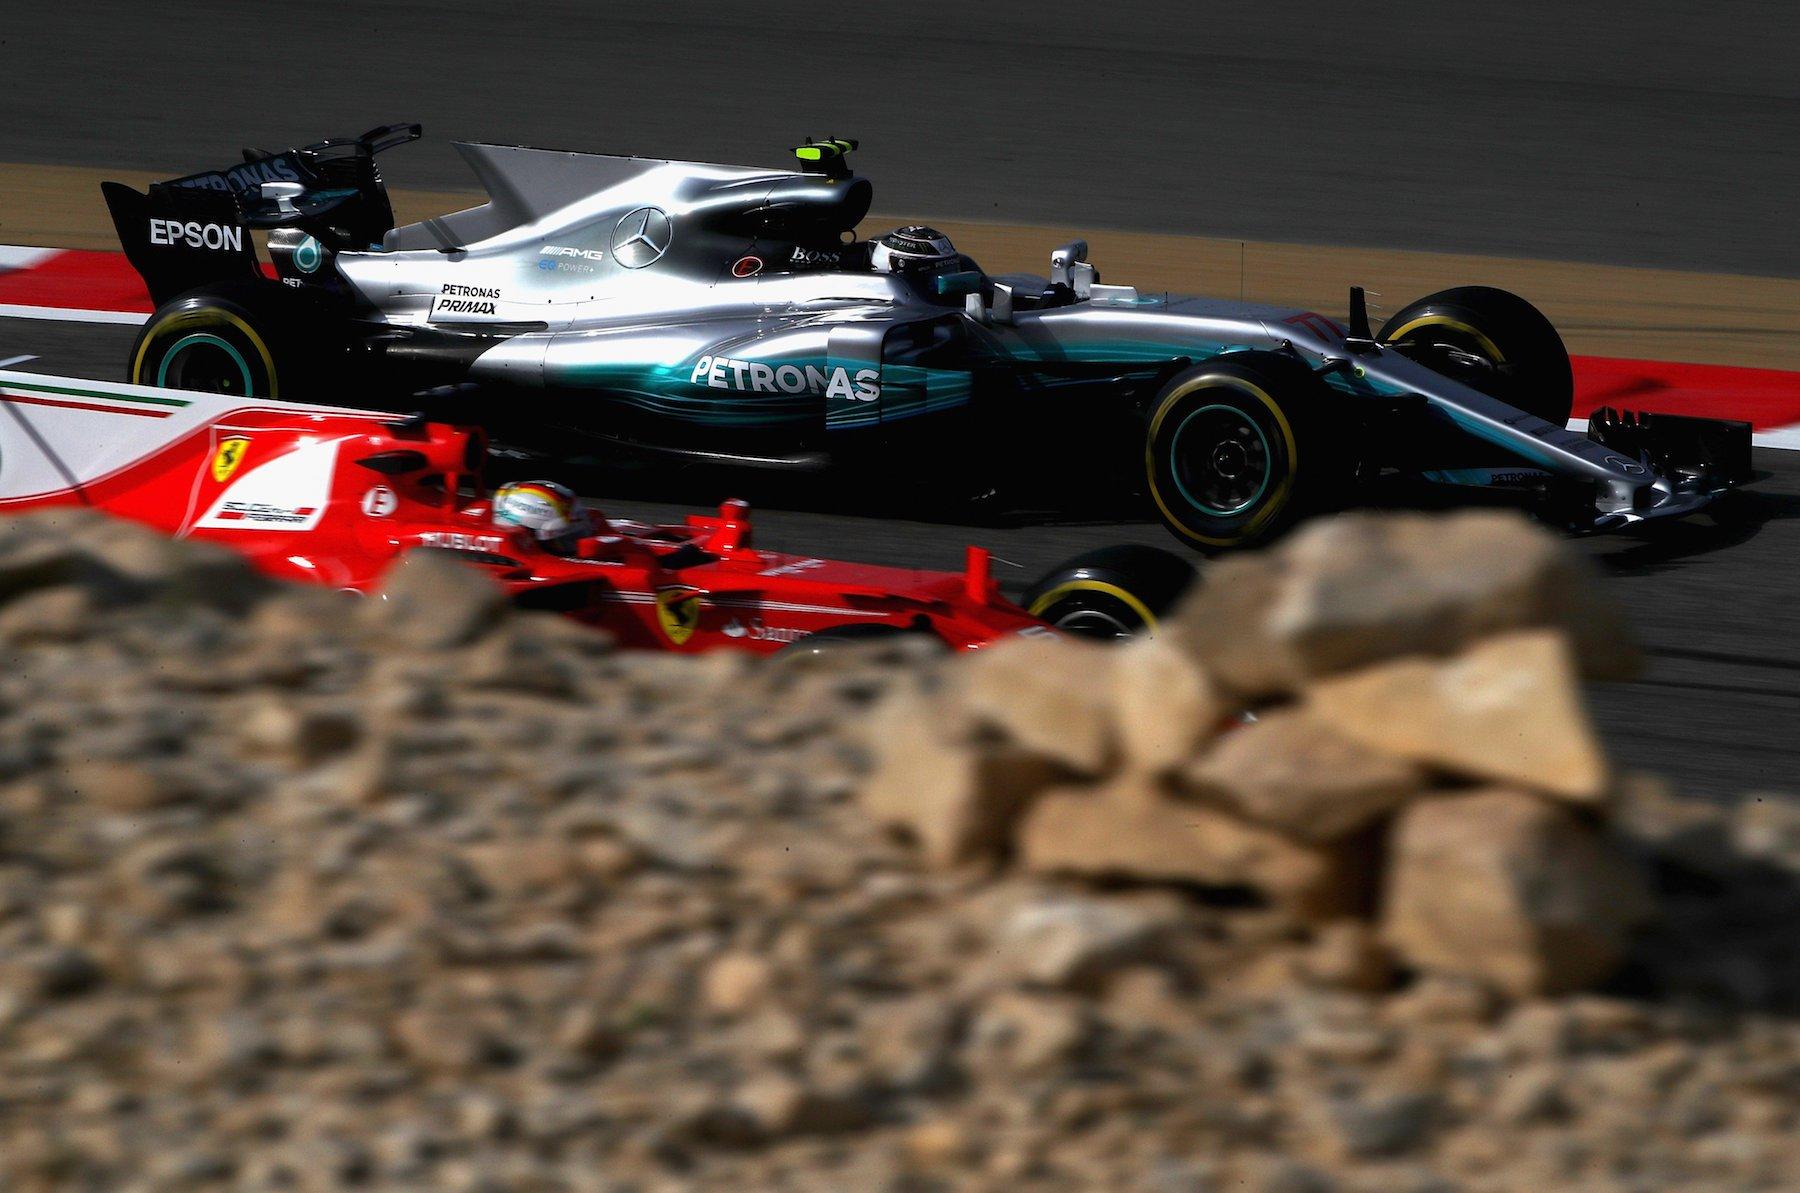 2017 Vettel and Bottas during FP1 at Bahrain 2017 copy.jpg